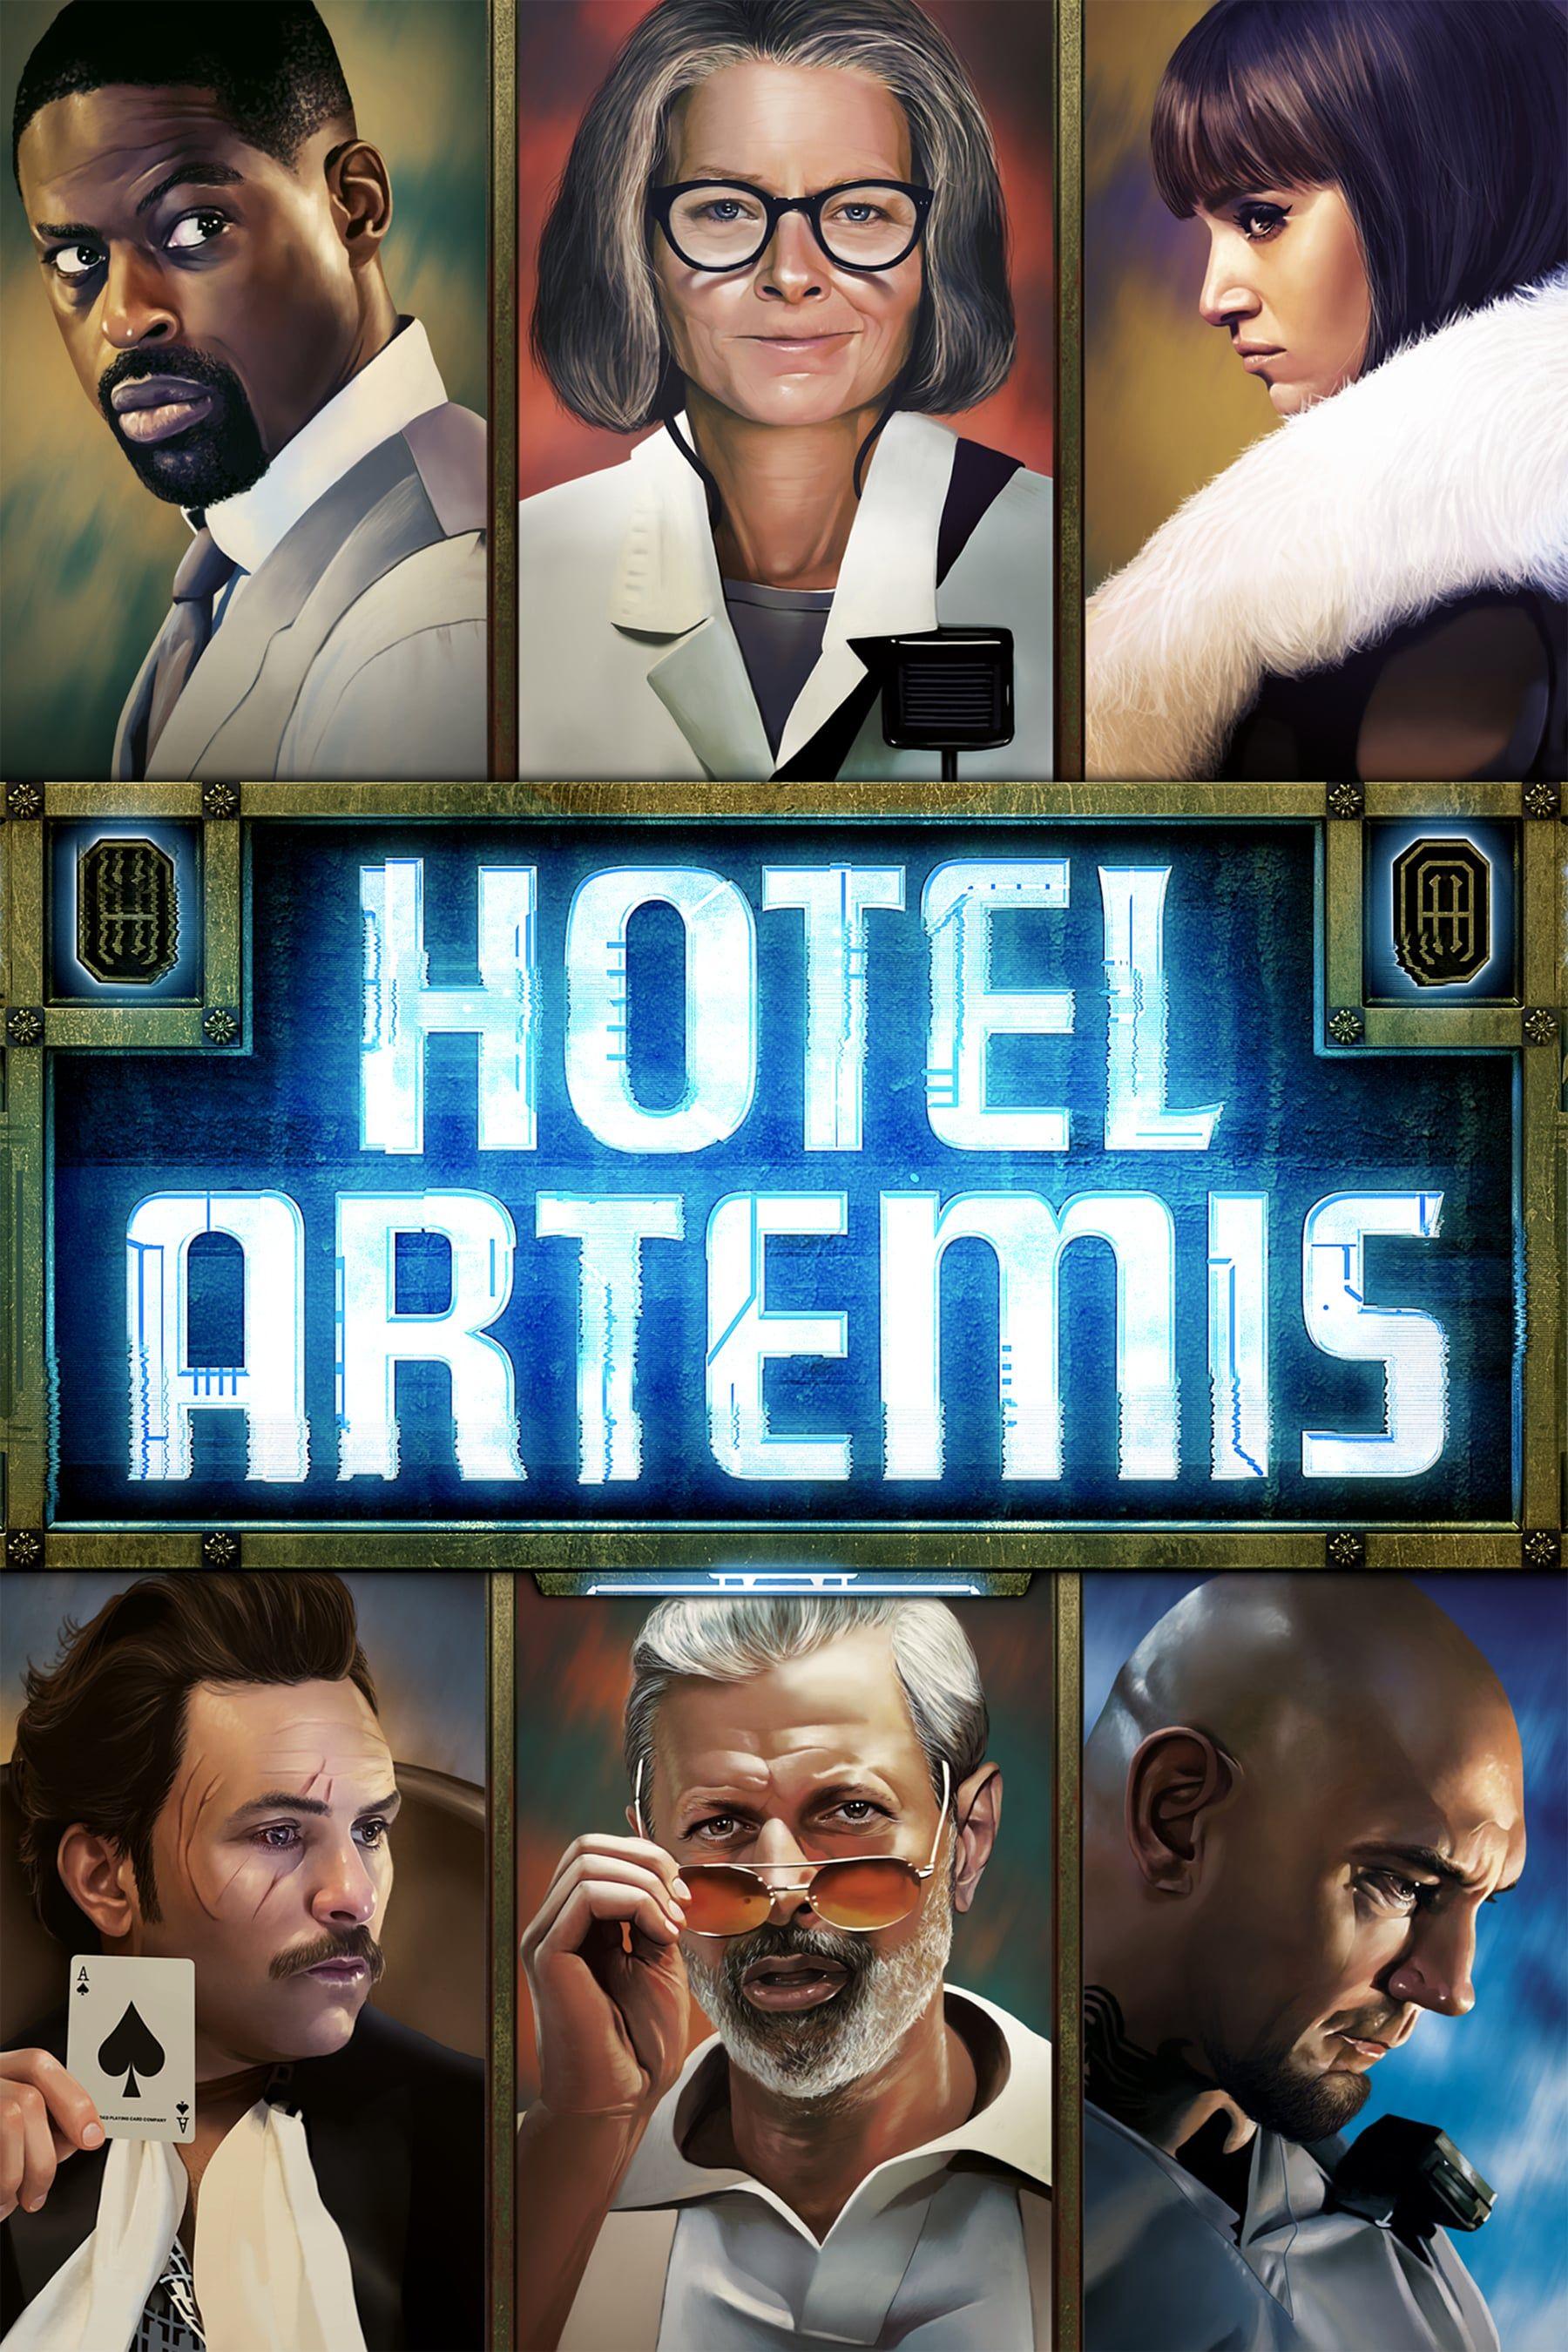 Hotel Artemis 2018 Download Hd 1080p Dvdrip Dvdscr Hd Avi Movie